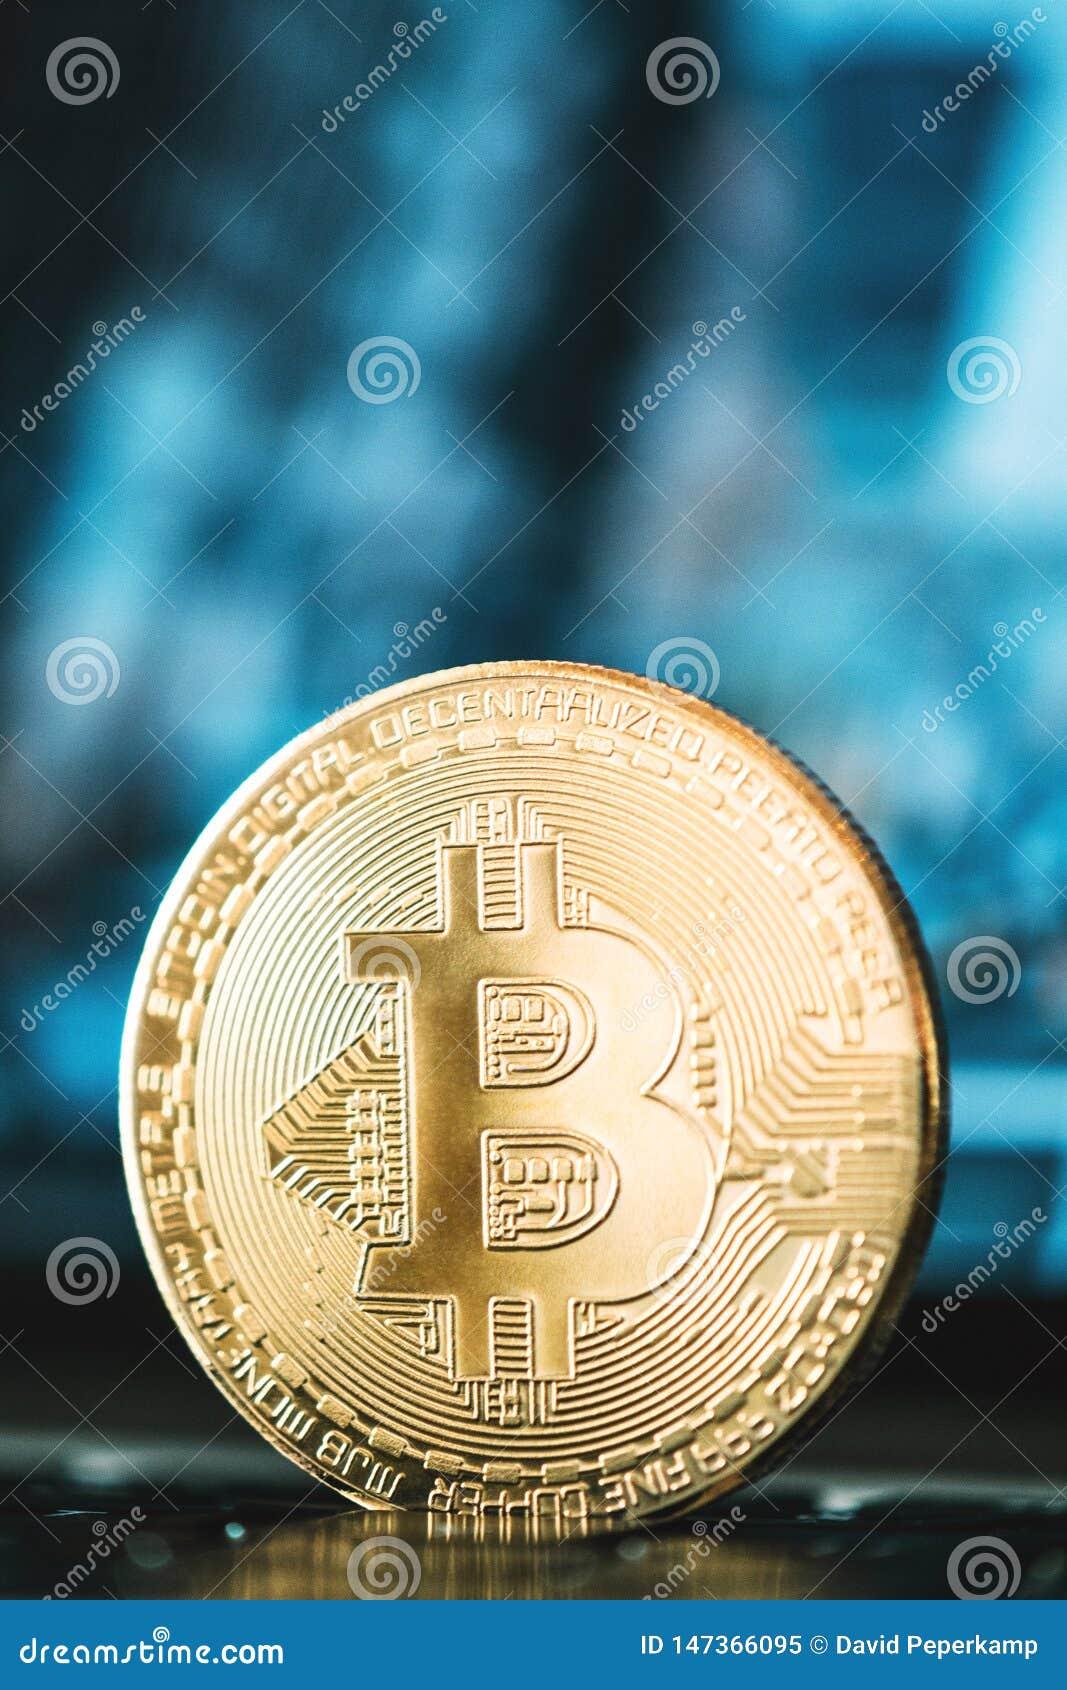 Bitcoinclose-up, bedrijfsachtergrond, bitcoin concept, cryptocurrency, blockchain